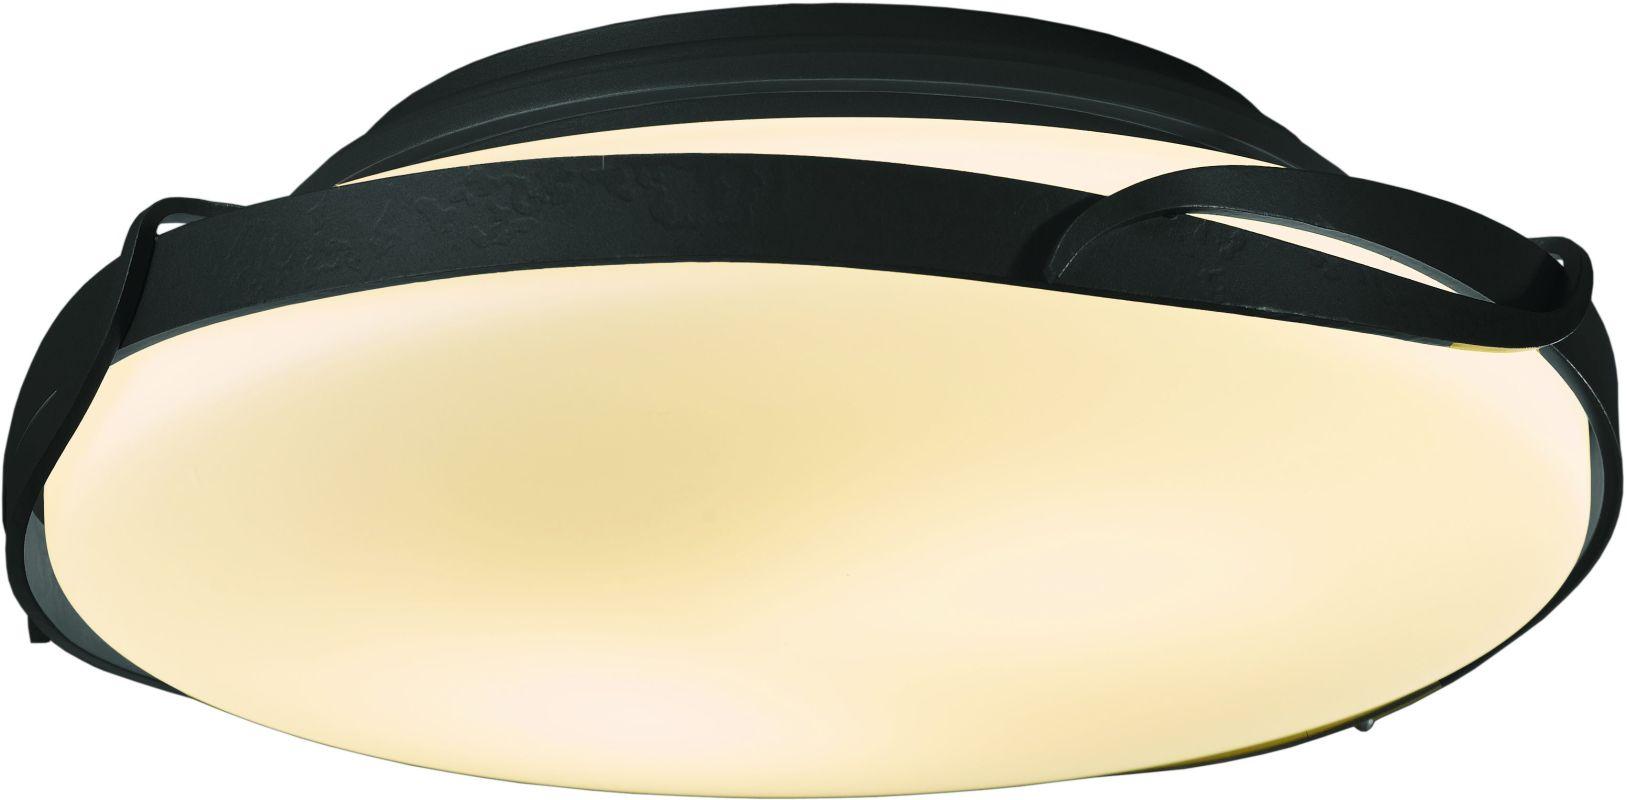 Hubbardton Forge 126740 2 Light Semi-Flush Ceiling Light from the Sale $431.20 ITEM#: 2007253 MODEL# :126740-10 :